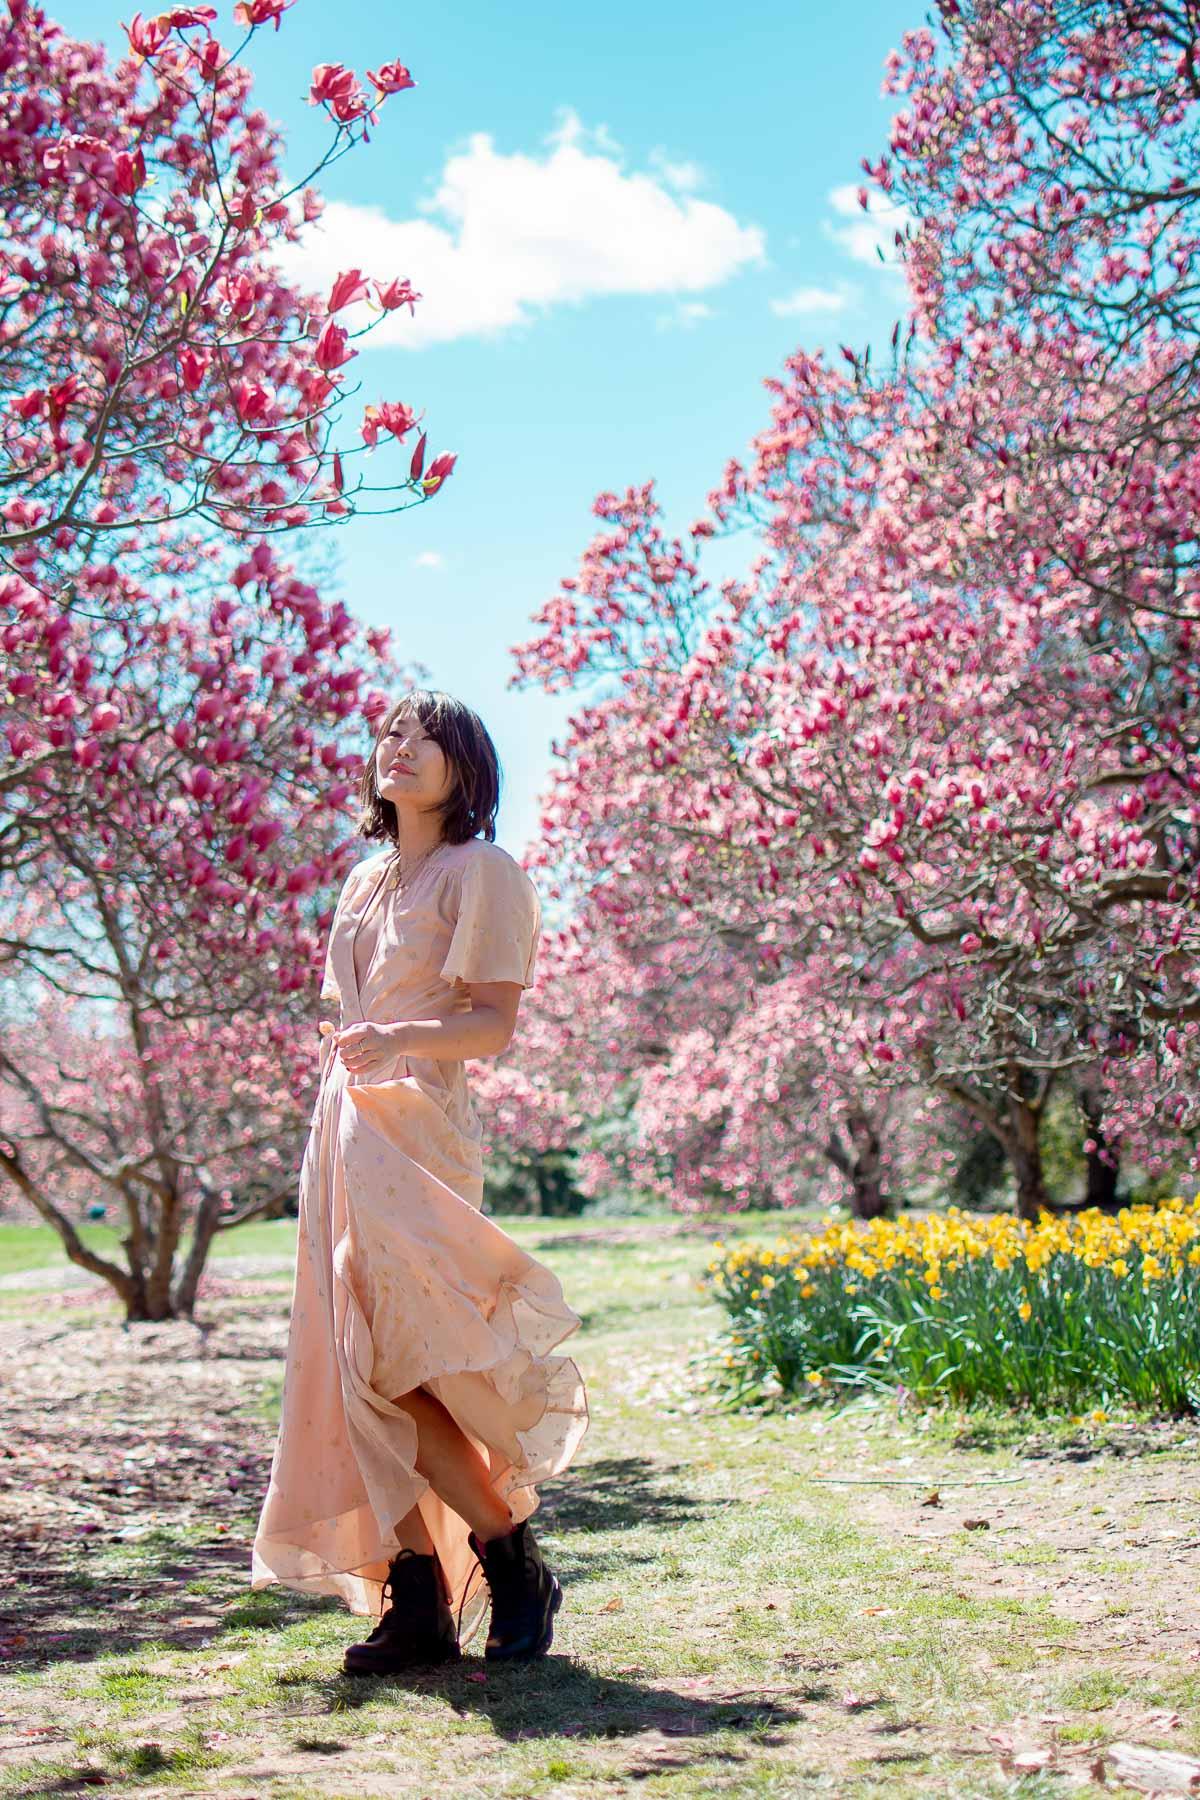 national arboretum cherry blossoms